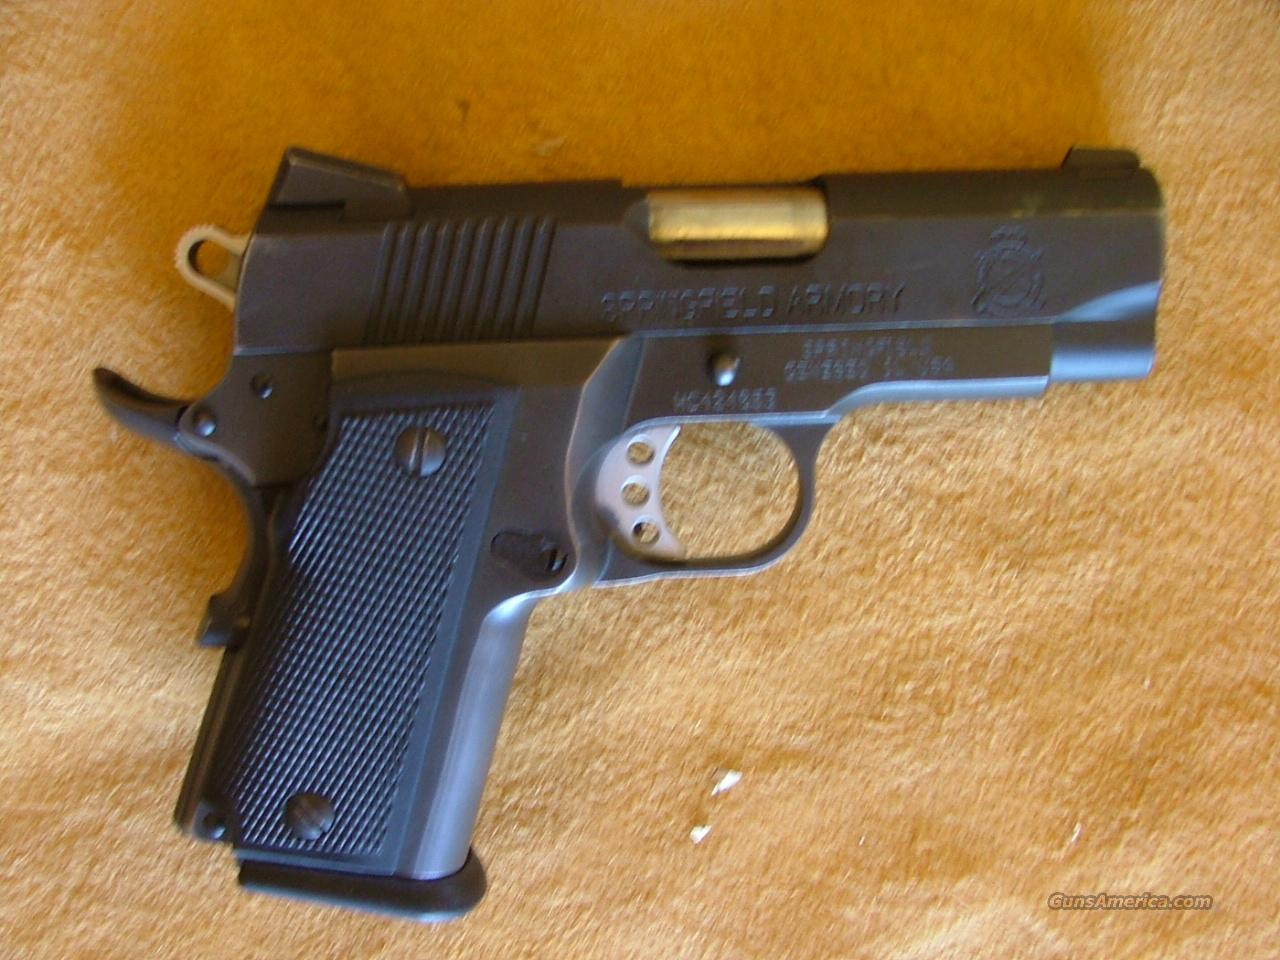 High Capacity 45 Acp Pistols For Sale | Hairrs us